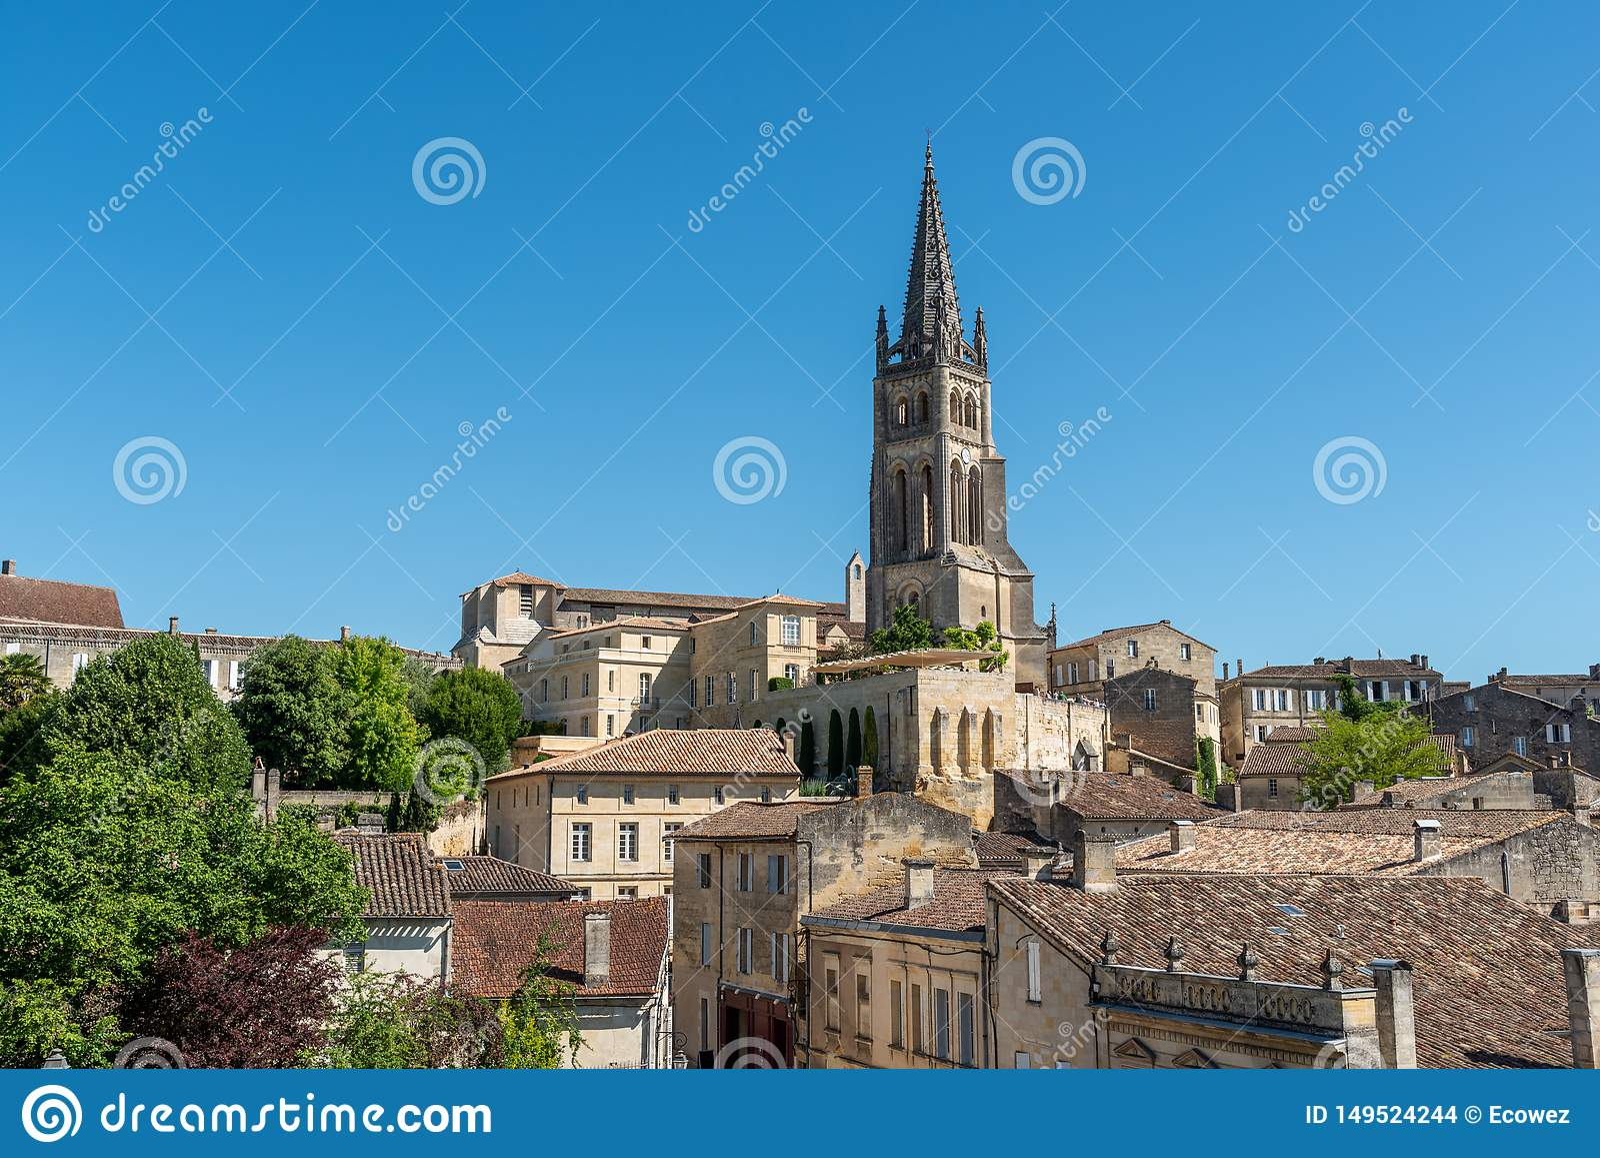 Saint Emilion, In Gironde, France: The Medieval Village ...